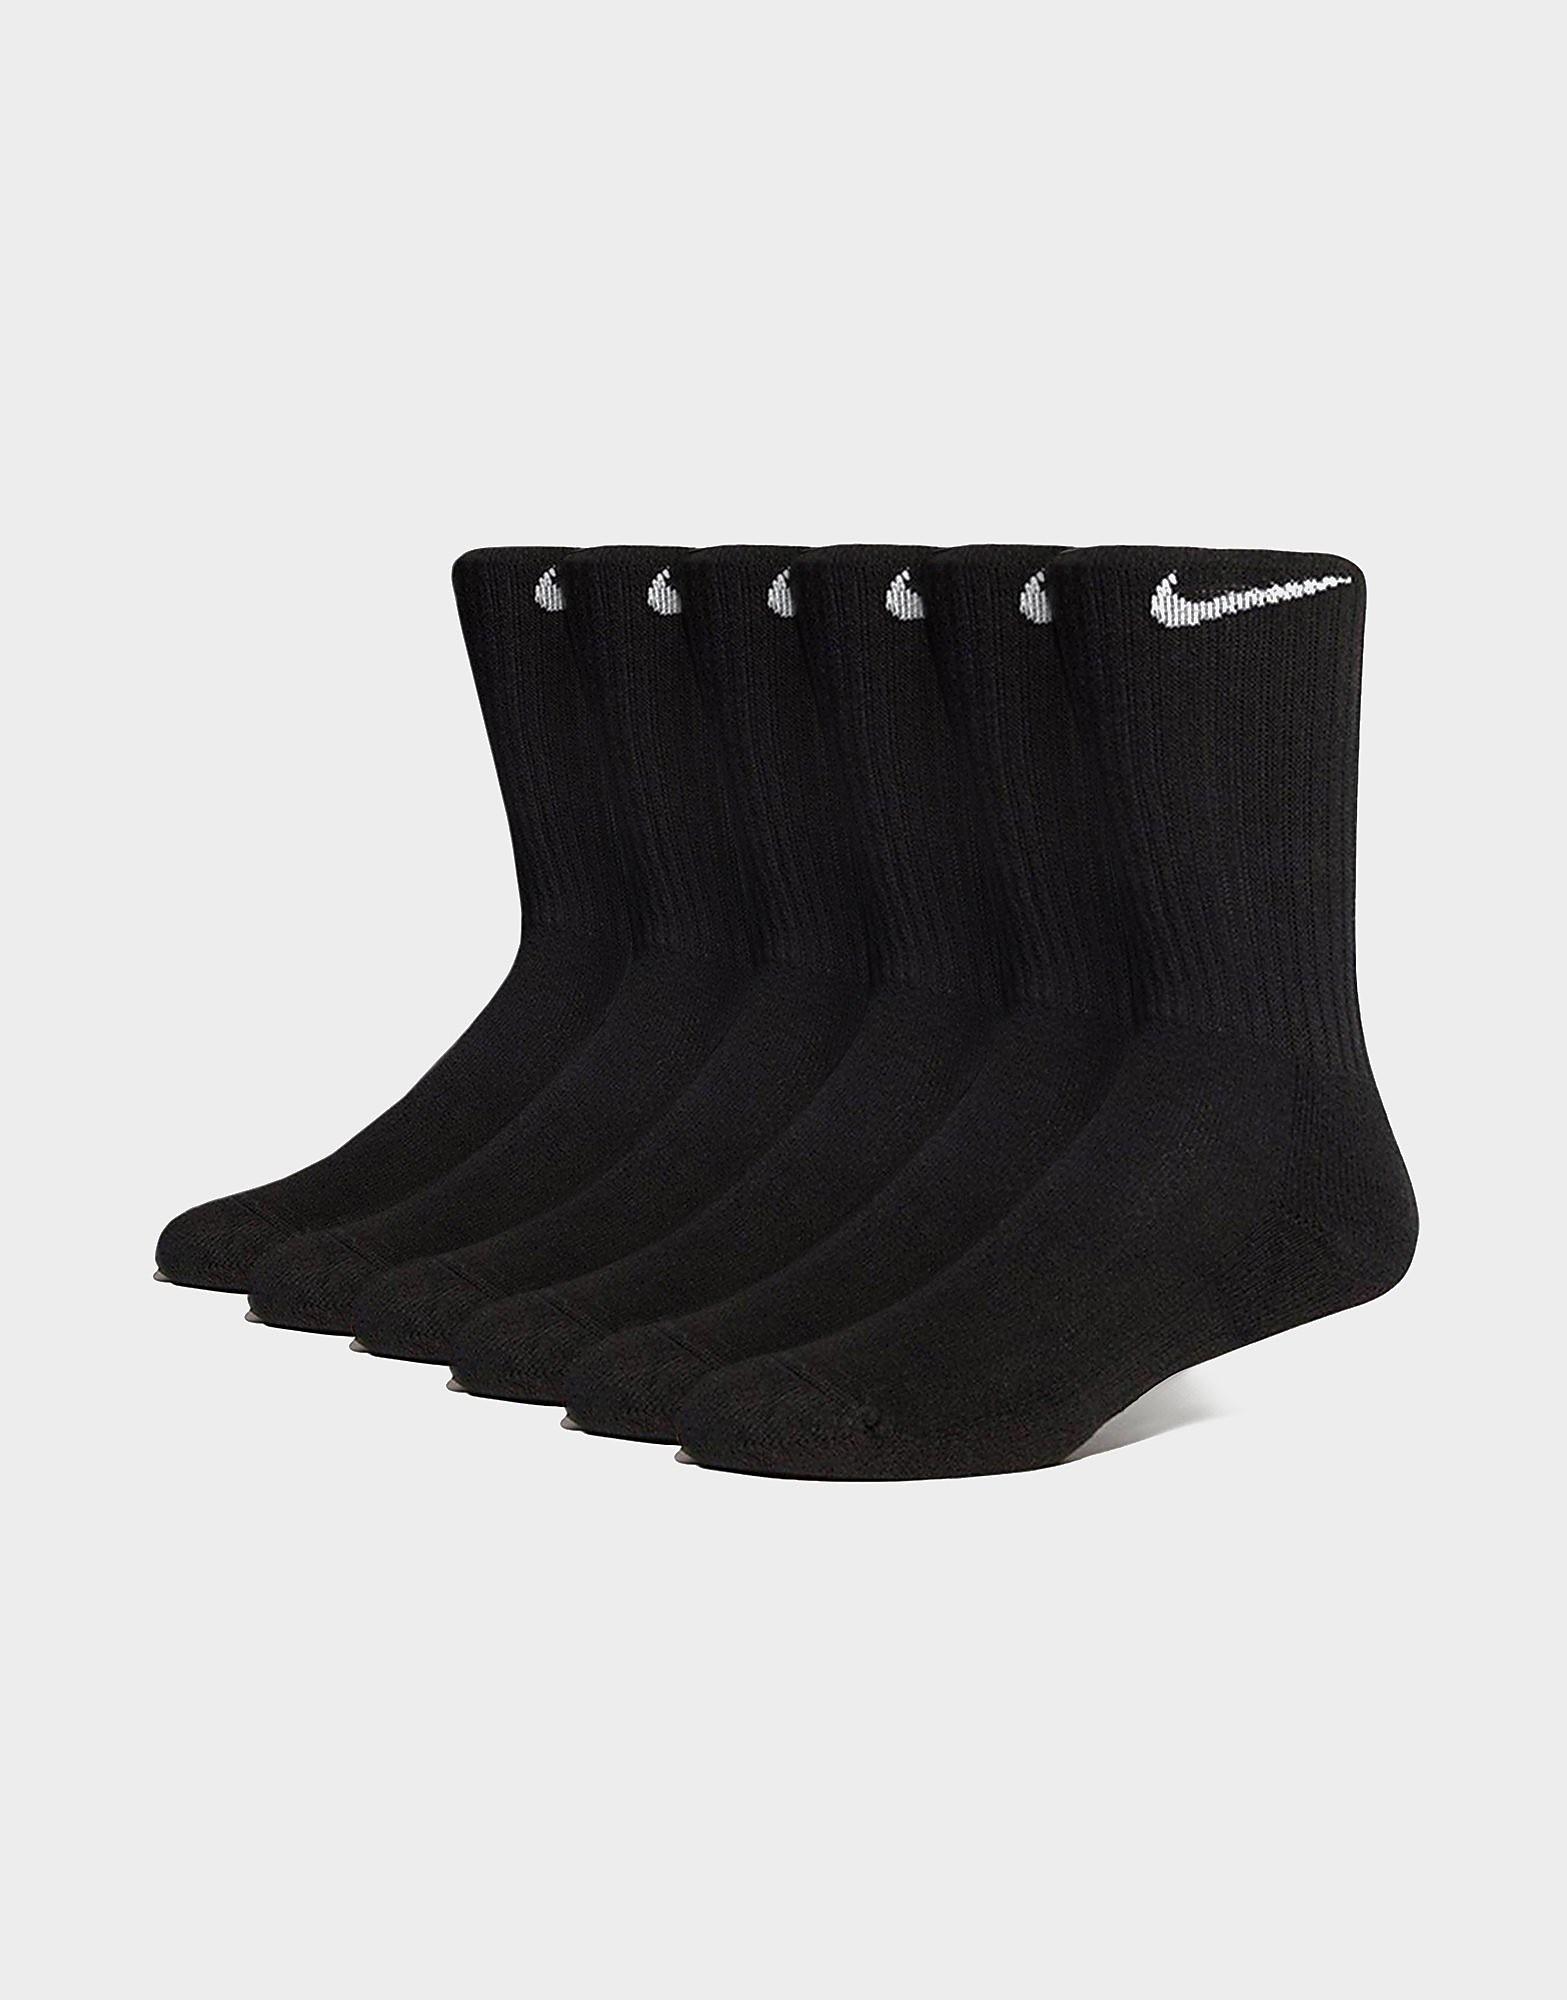 Nike 6 Pack Cushion Crew Socks Heren Zwart Heren